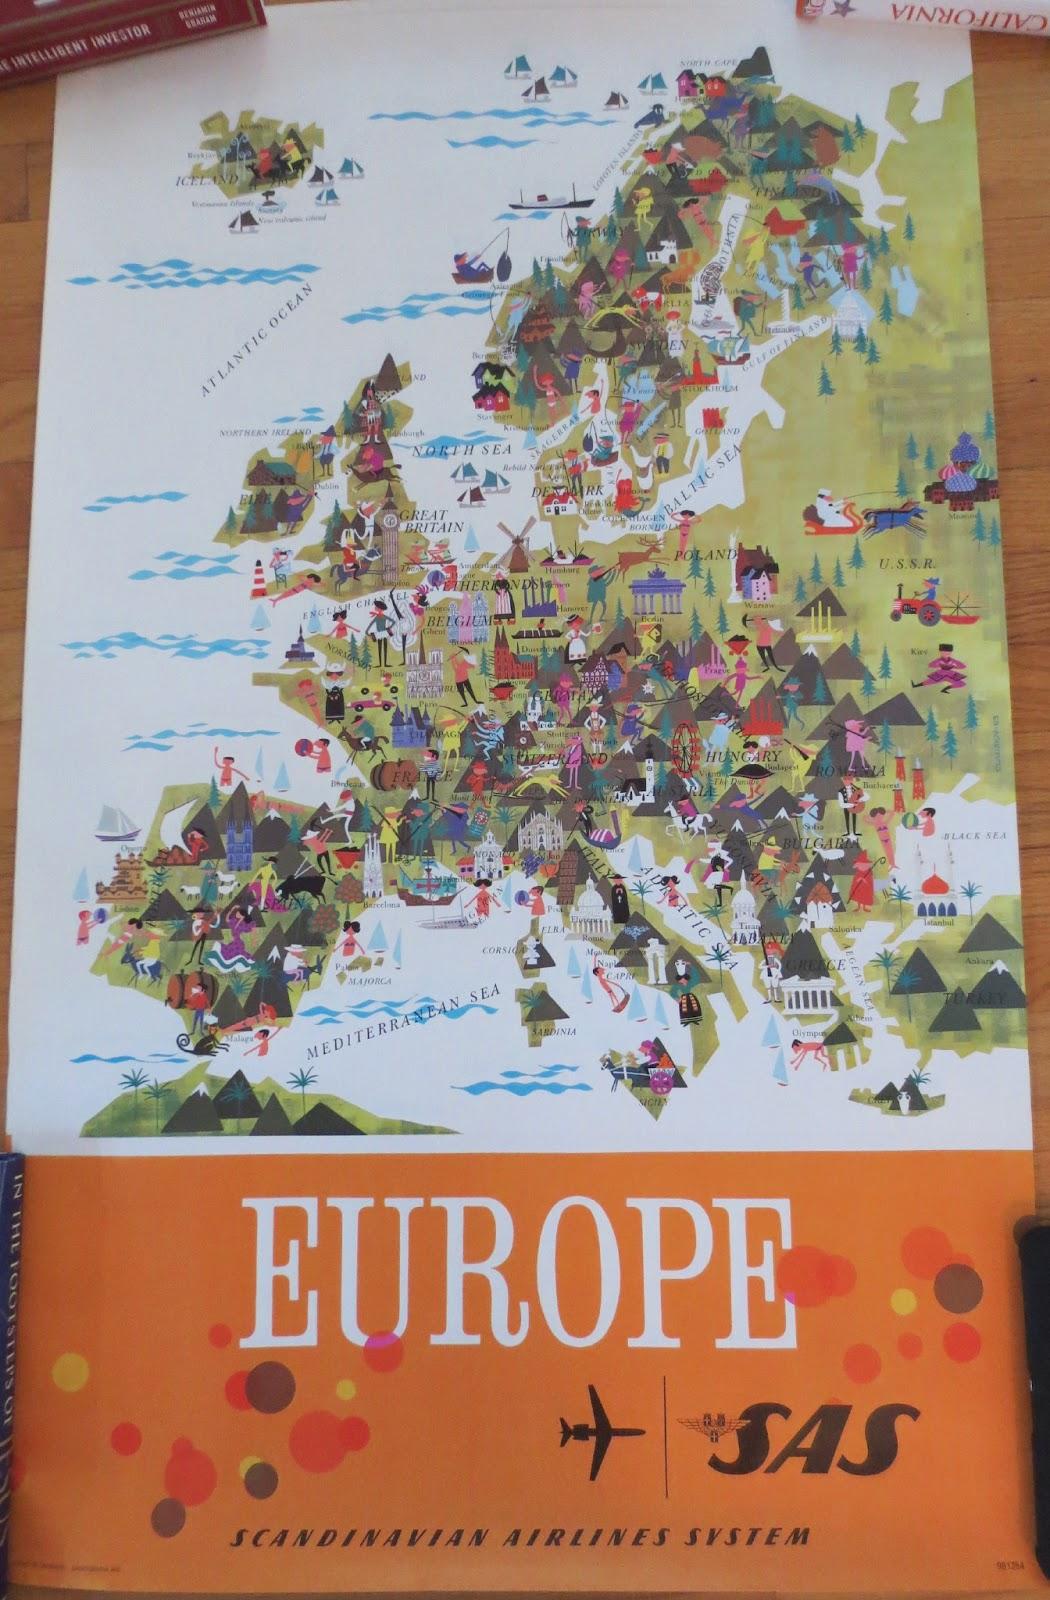 sas europe map 24x38 inches 1 original